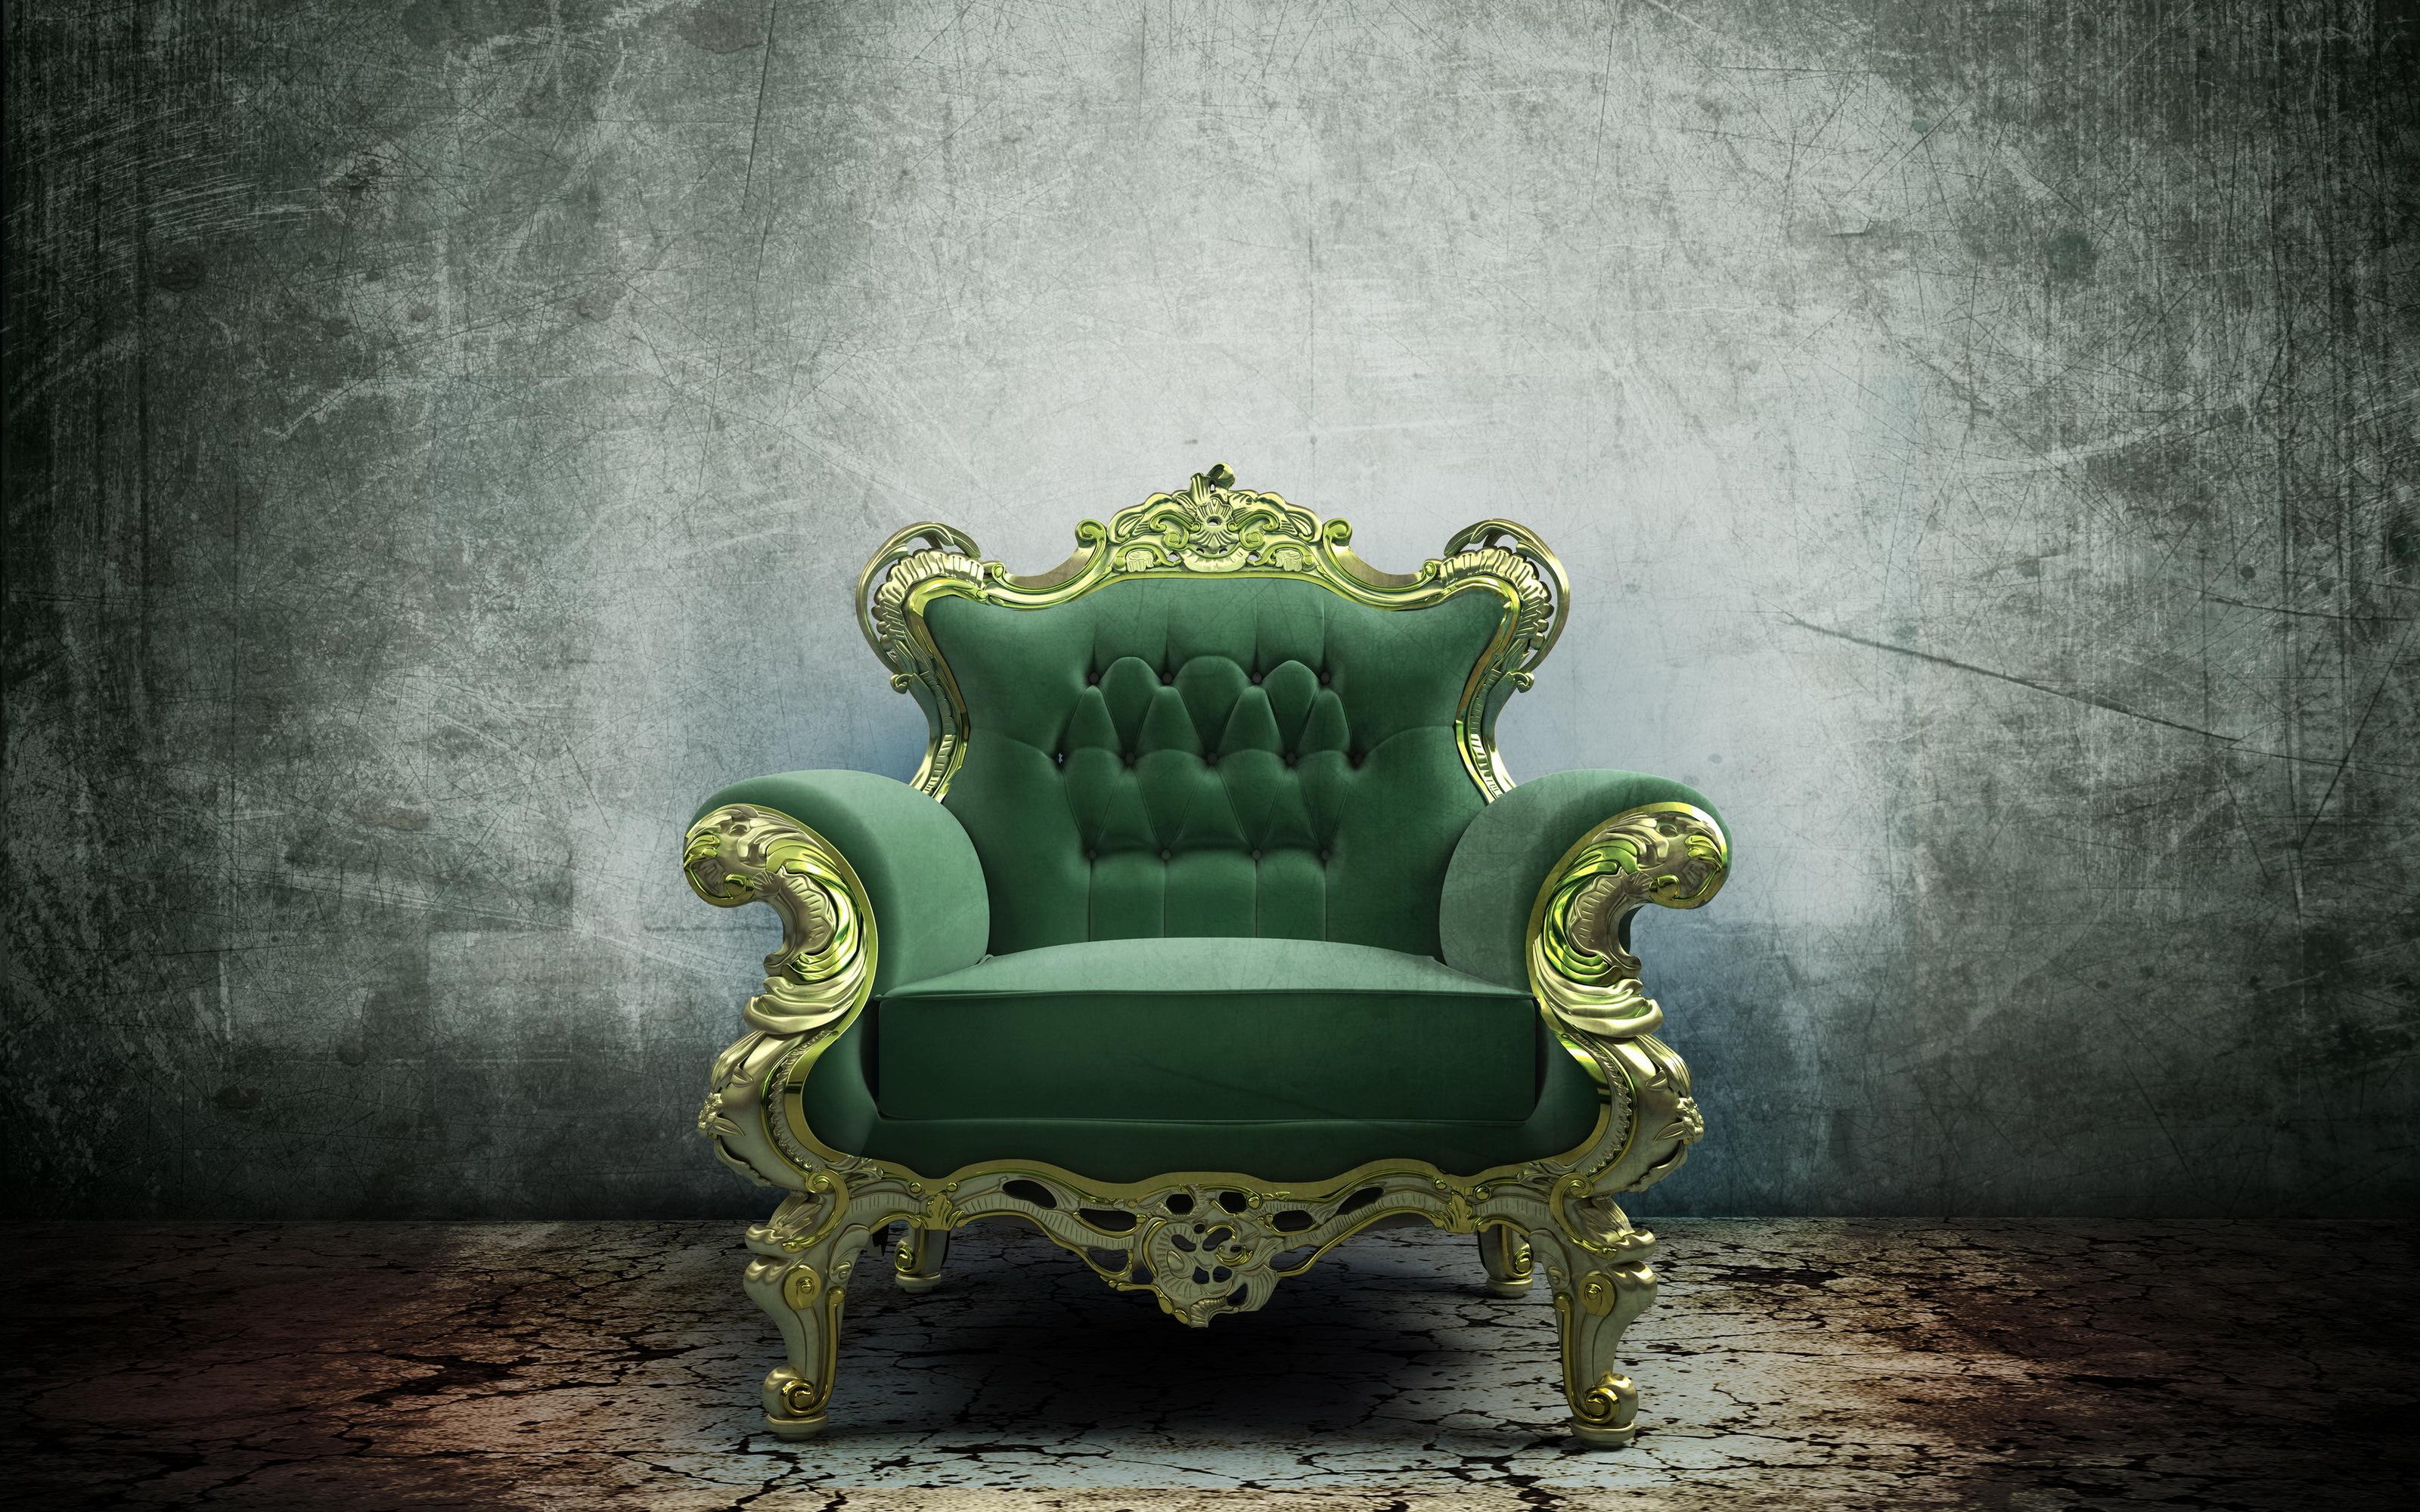 Living room chair ideas - Royal Chair Wallpaper Forwallpaper Com Html Code